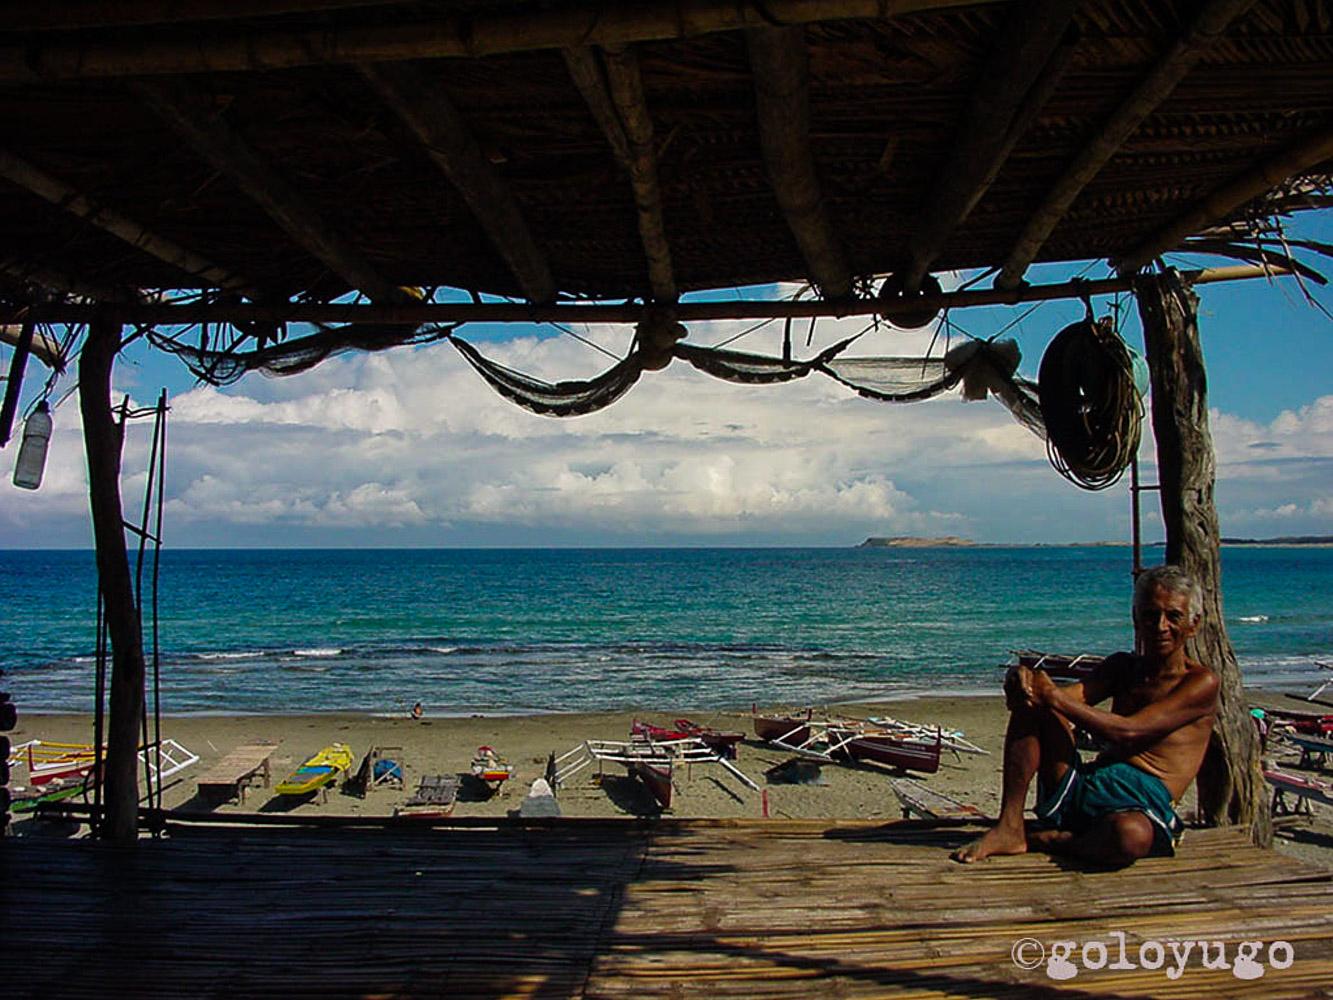 Fishing Village  Location: Ilocos Norte, Philippines